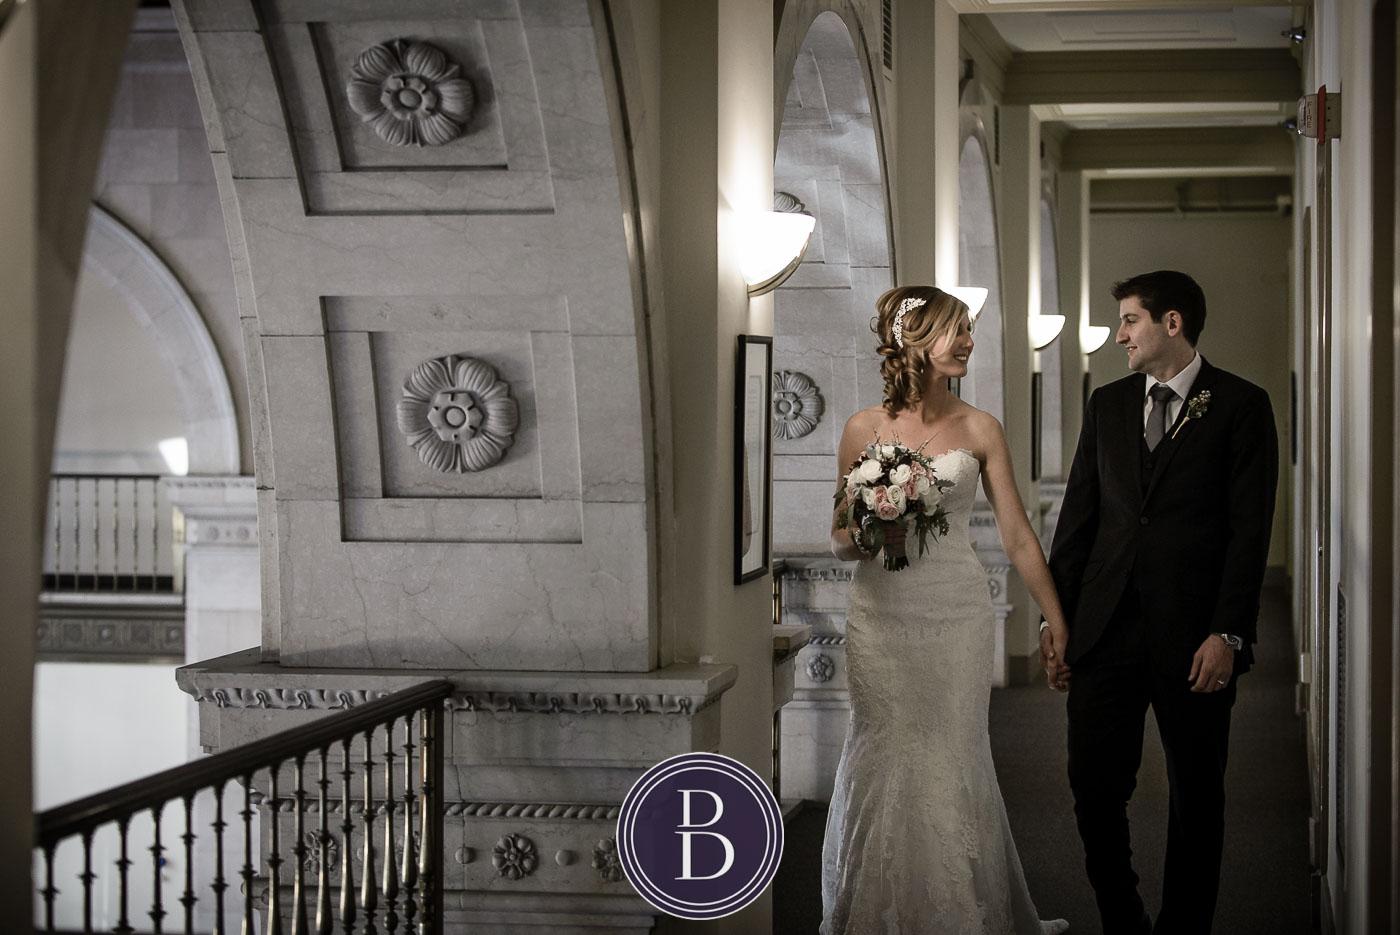 Portrait in the moment bride groom Hamilton building